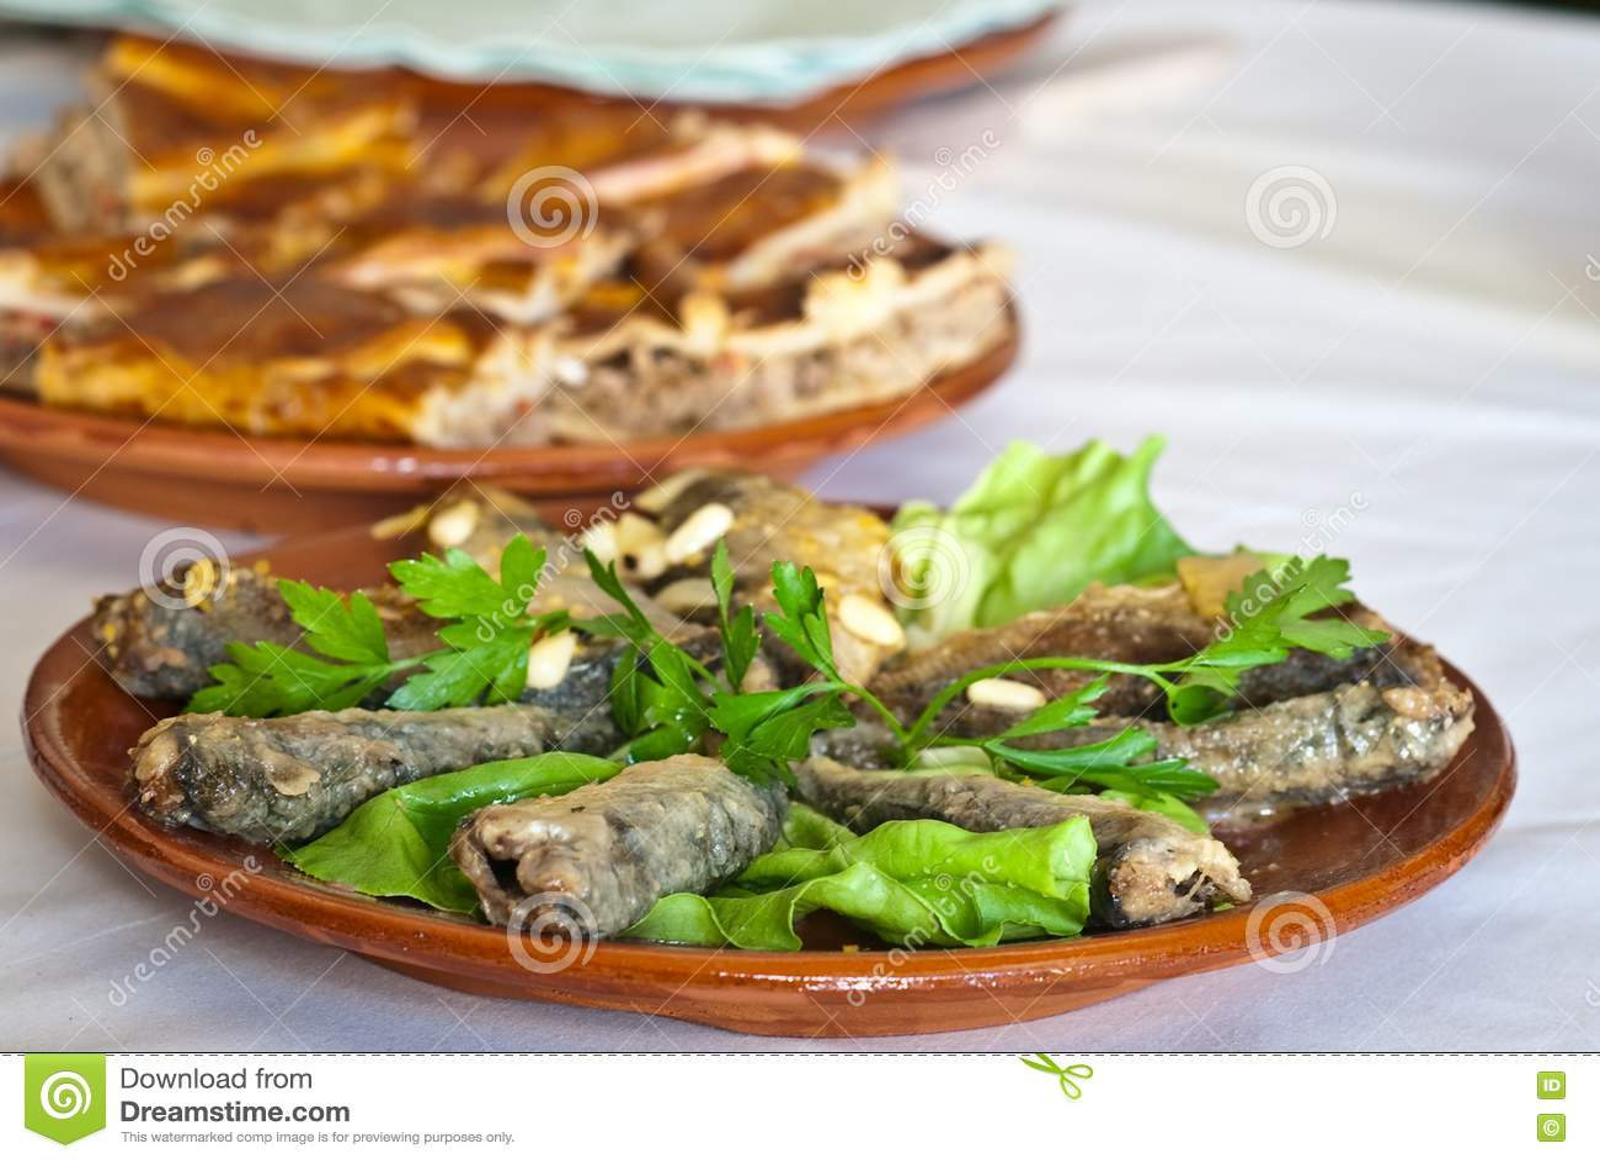 Fish marinade royalty free stock images image 22448829 for Marinade for fish